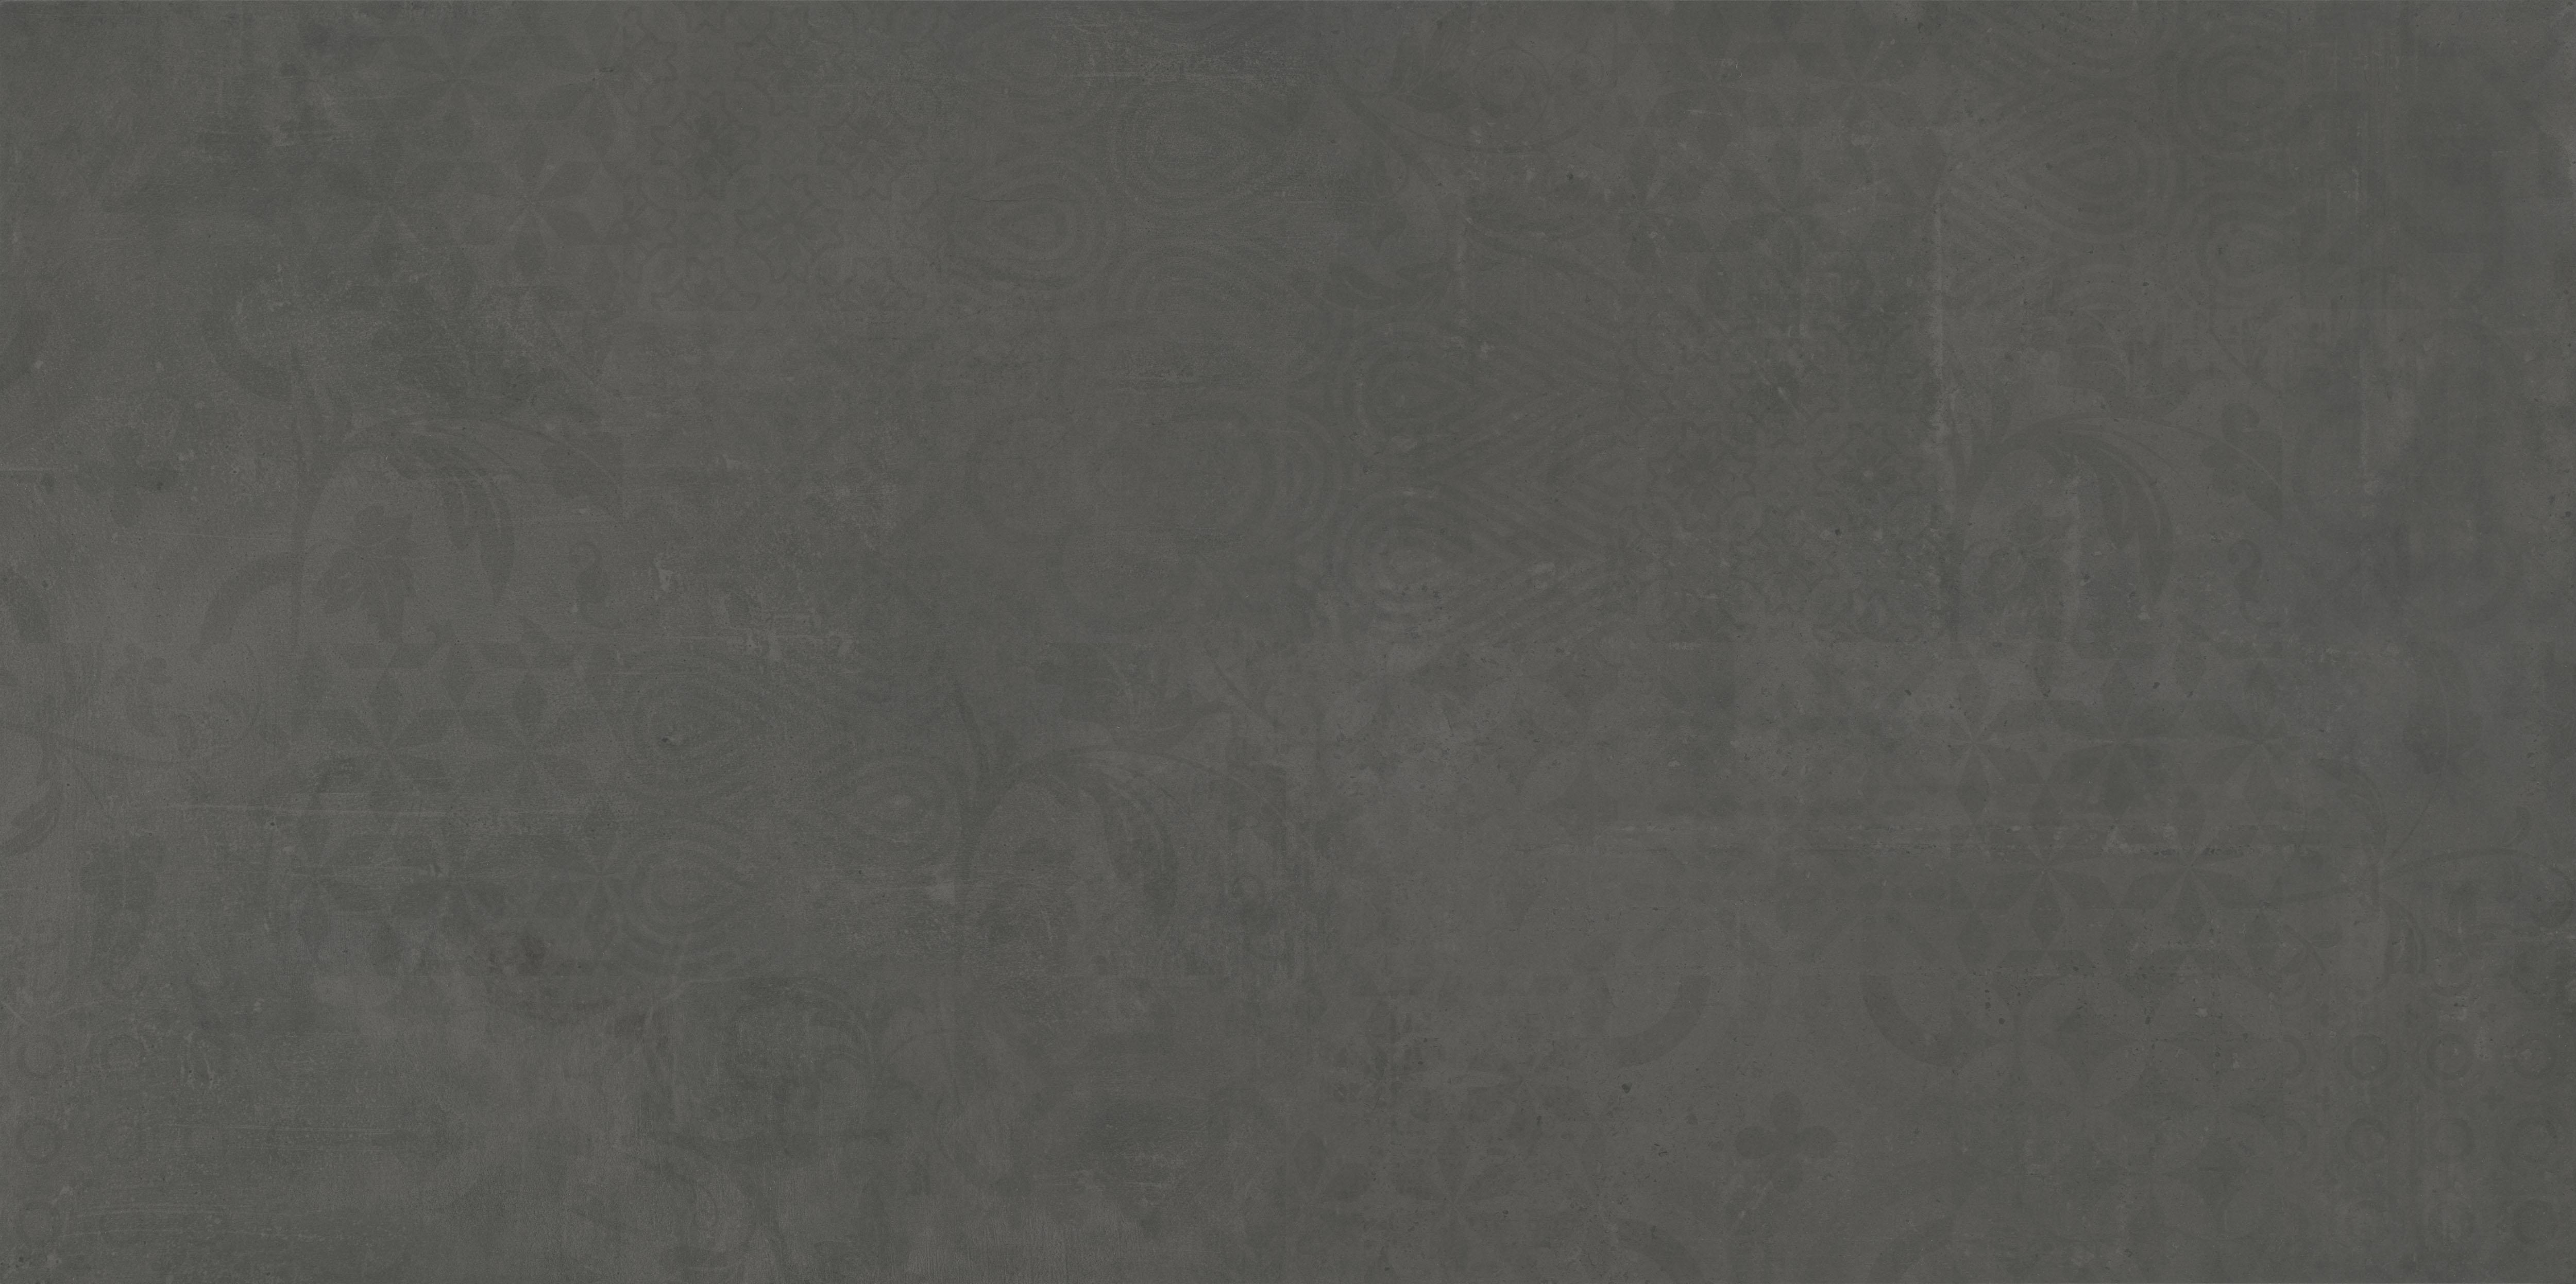 anthrazit Betonfliese mit Dekor 120x60, anthracite concrete effect tile with decor 120x60